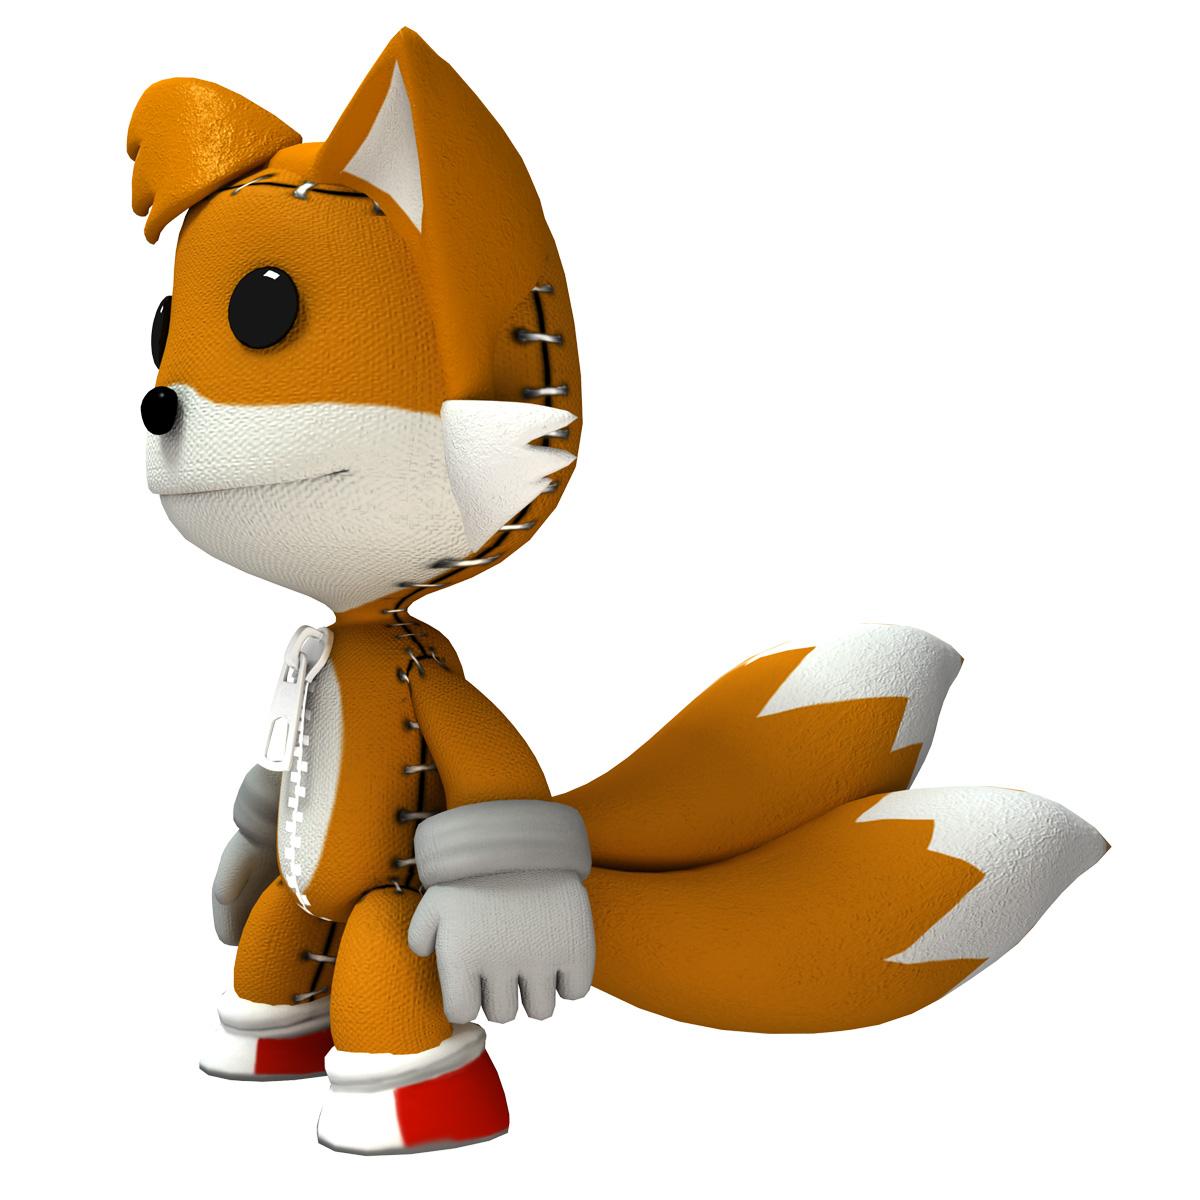 LittleBigPlanet PS3 Sonic 010